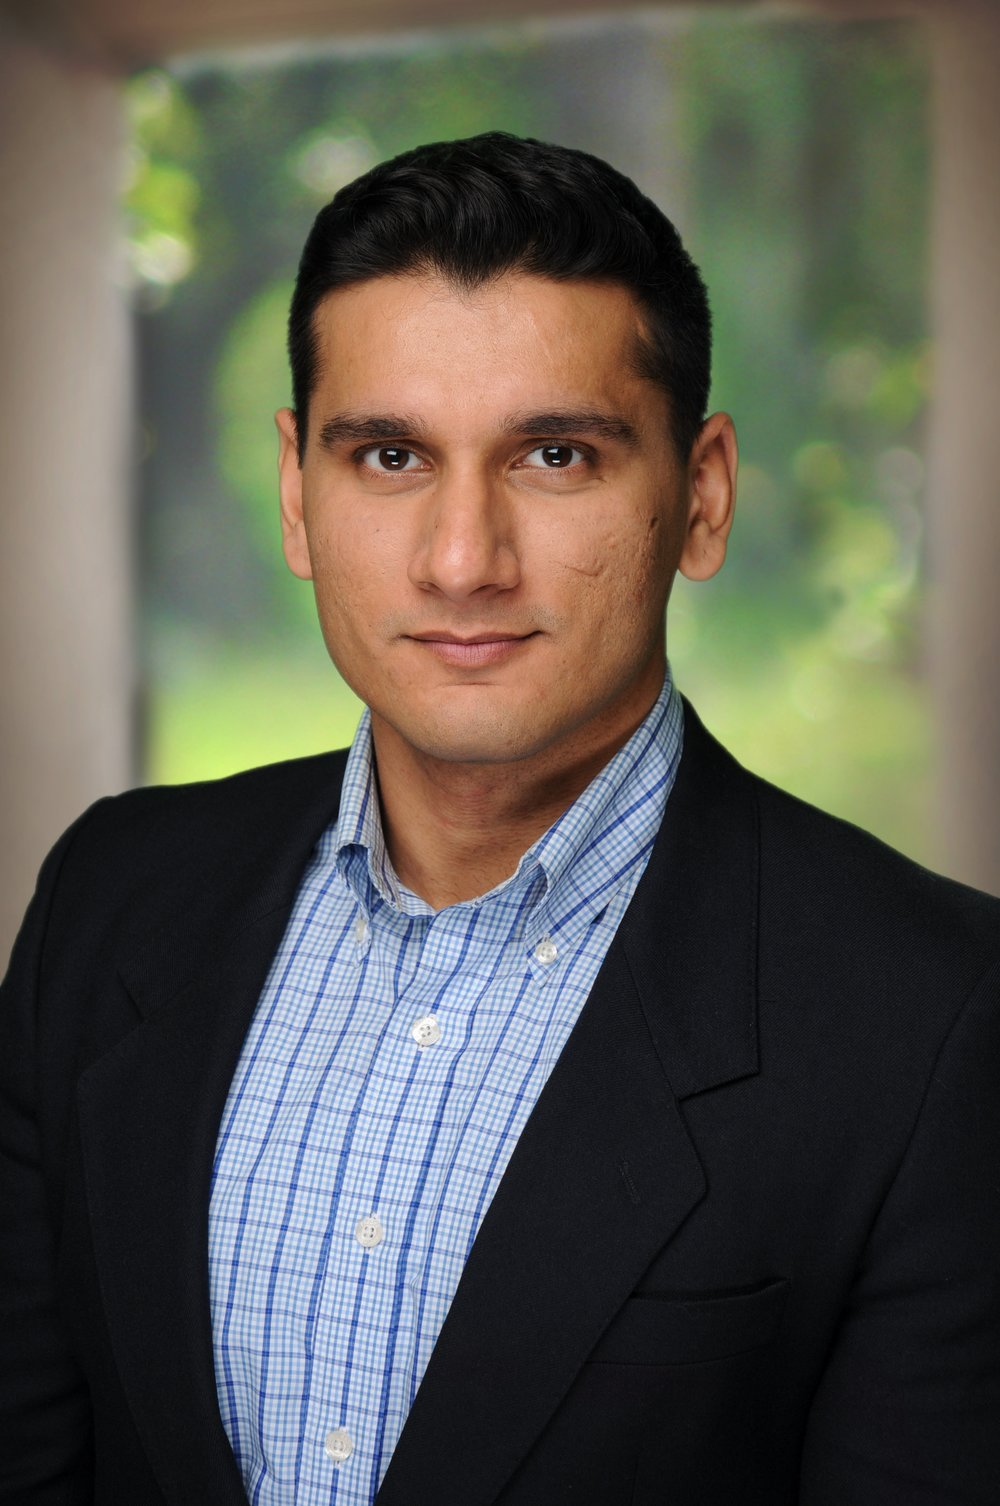 Sohail Mathur   AVP of Male Allies  sm8319@stern.nyu.edu